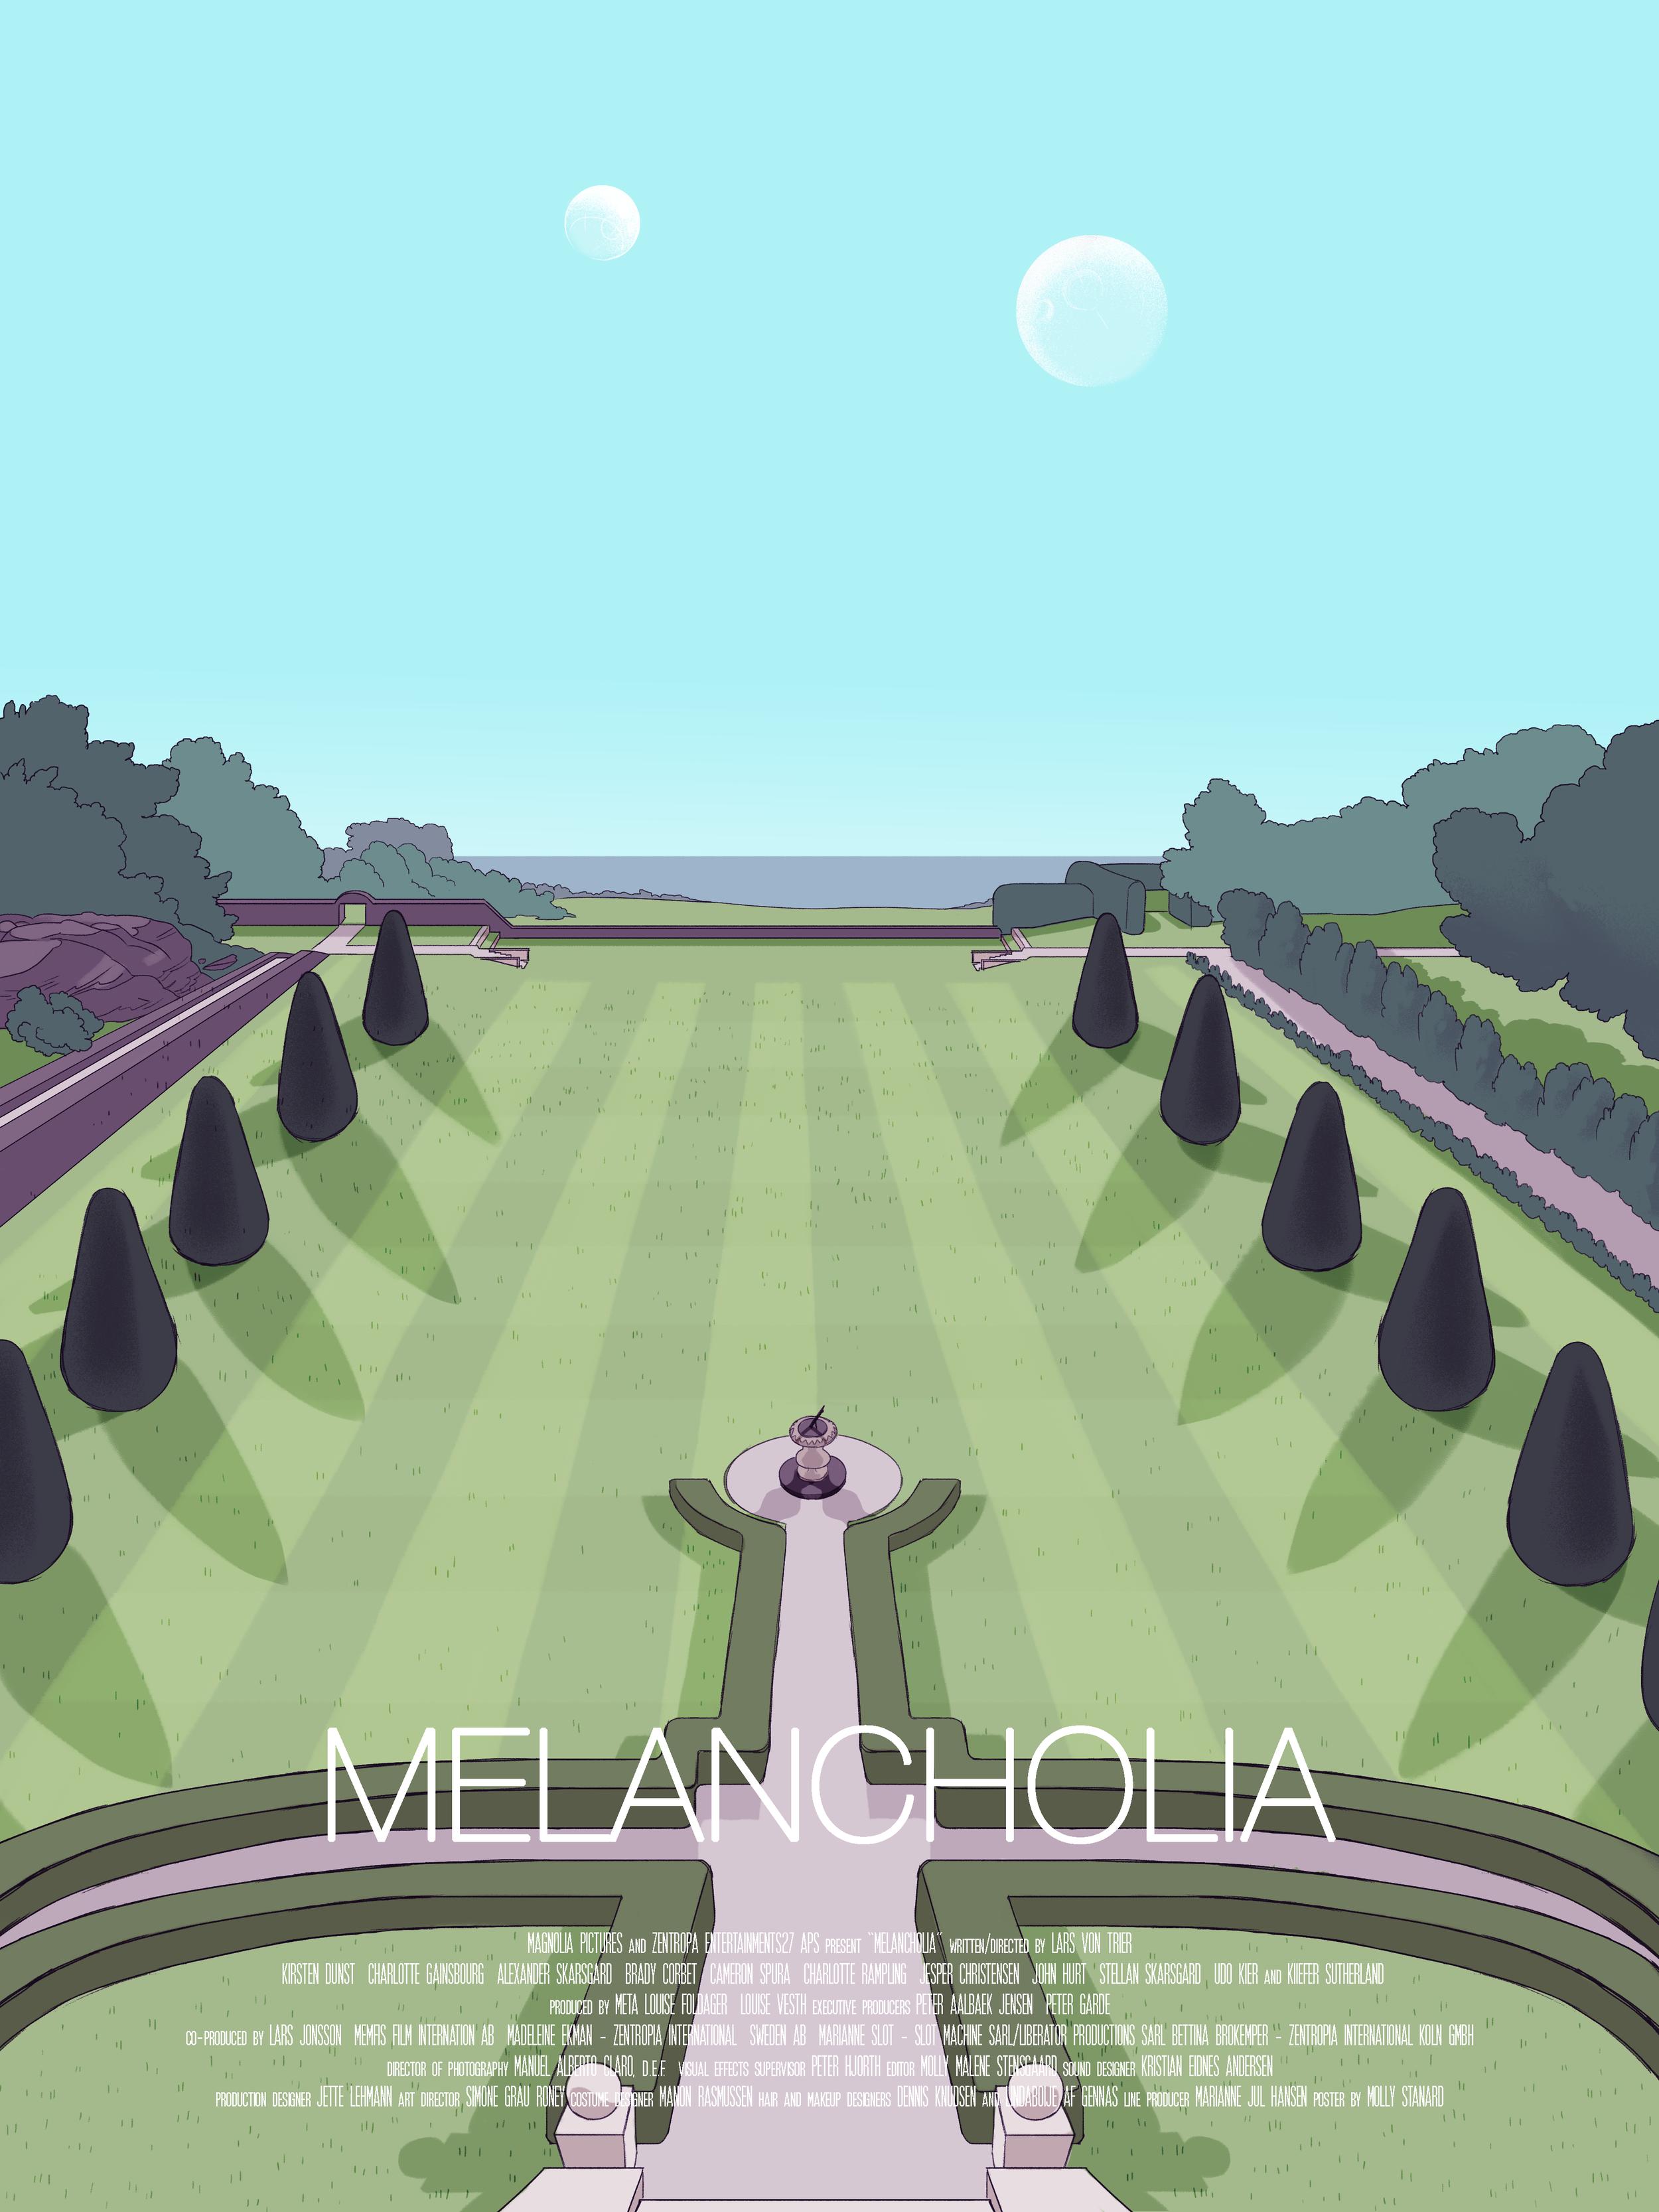 melancholia-coloredit.png